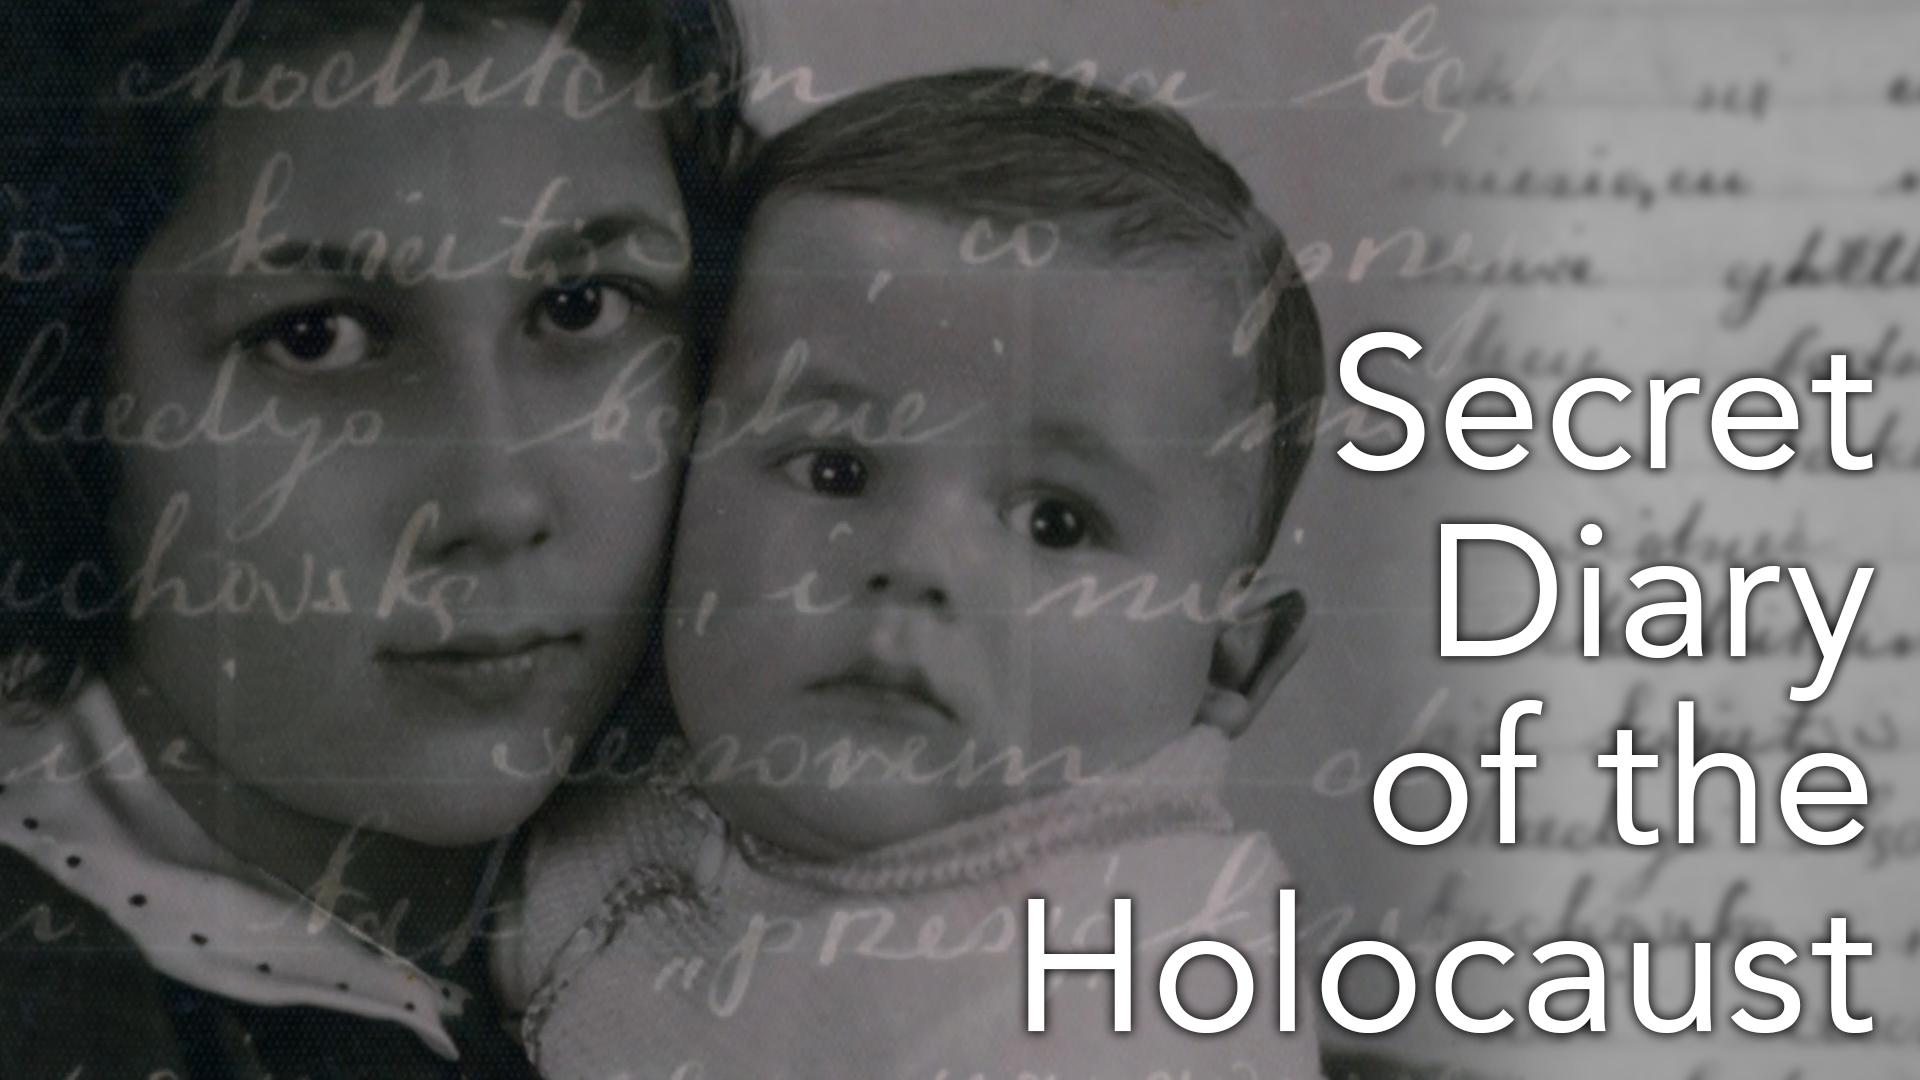 Secret Diary of the Holocaust